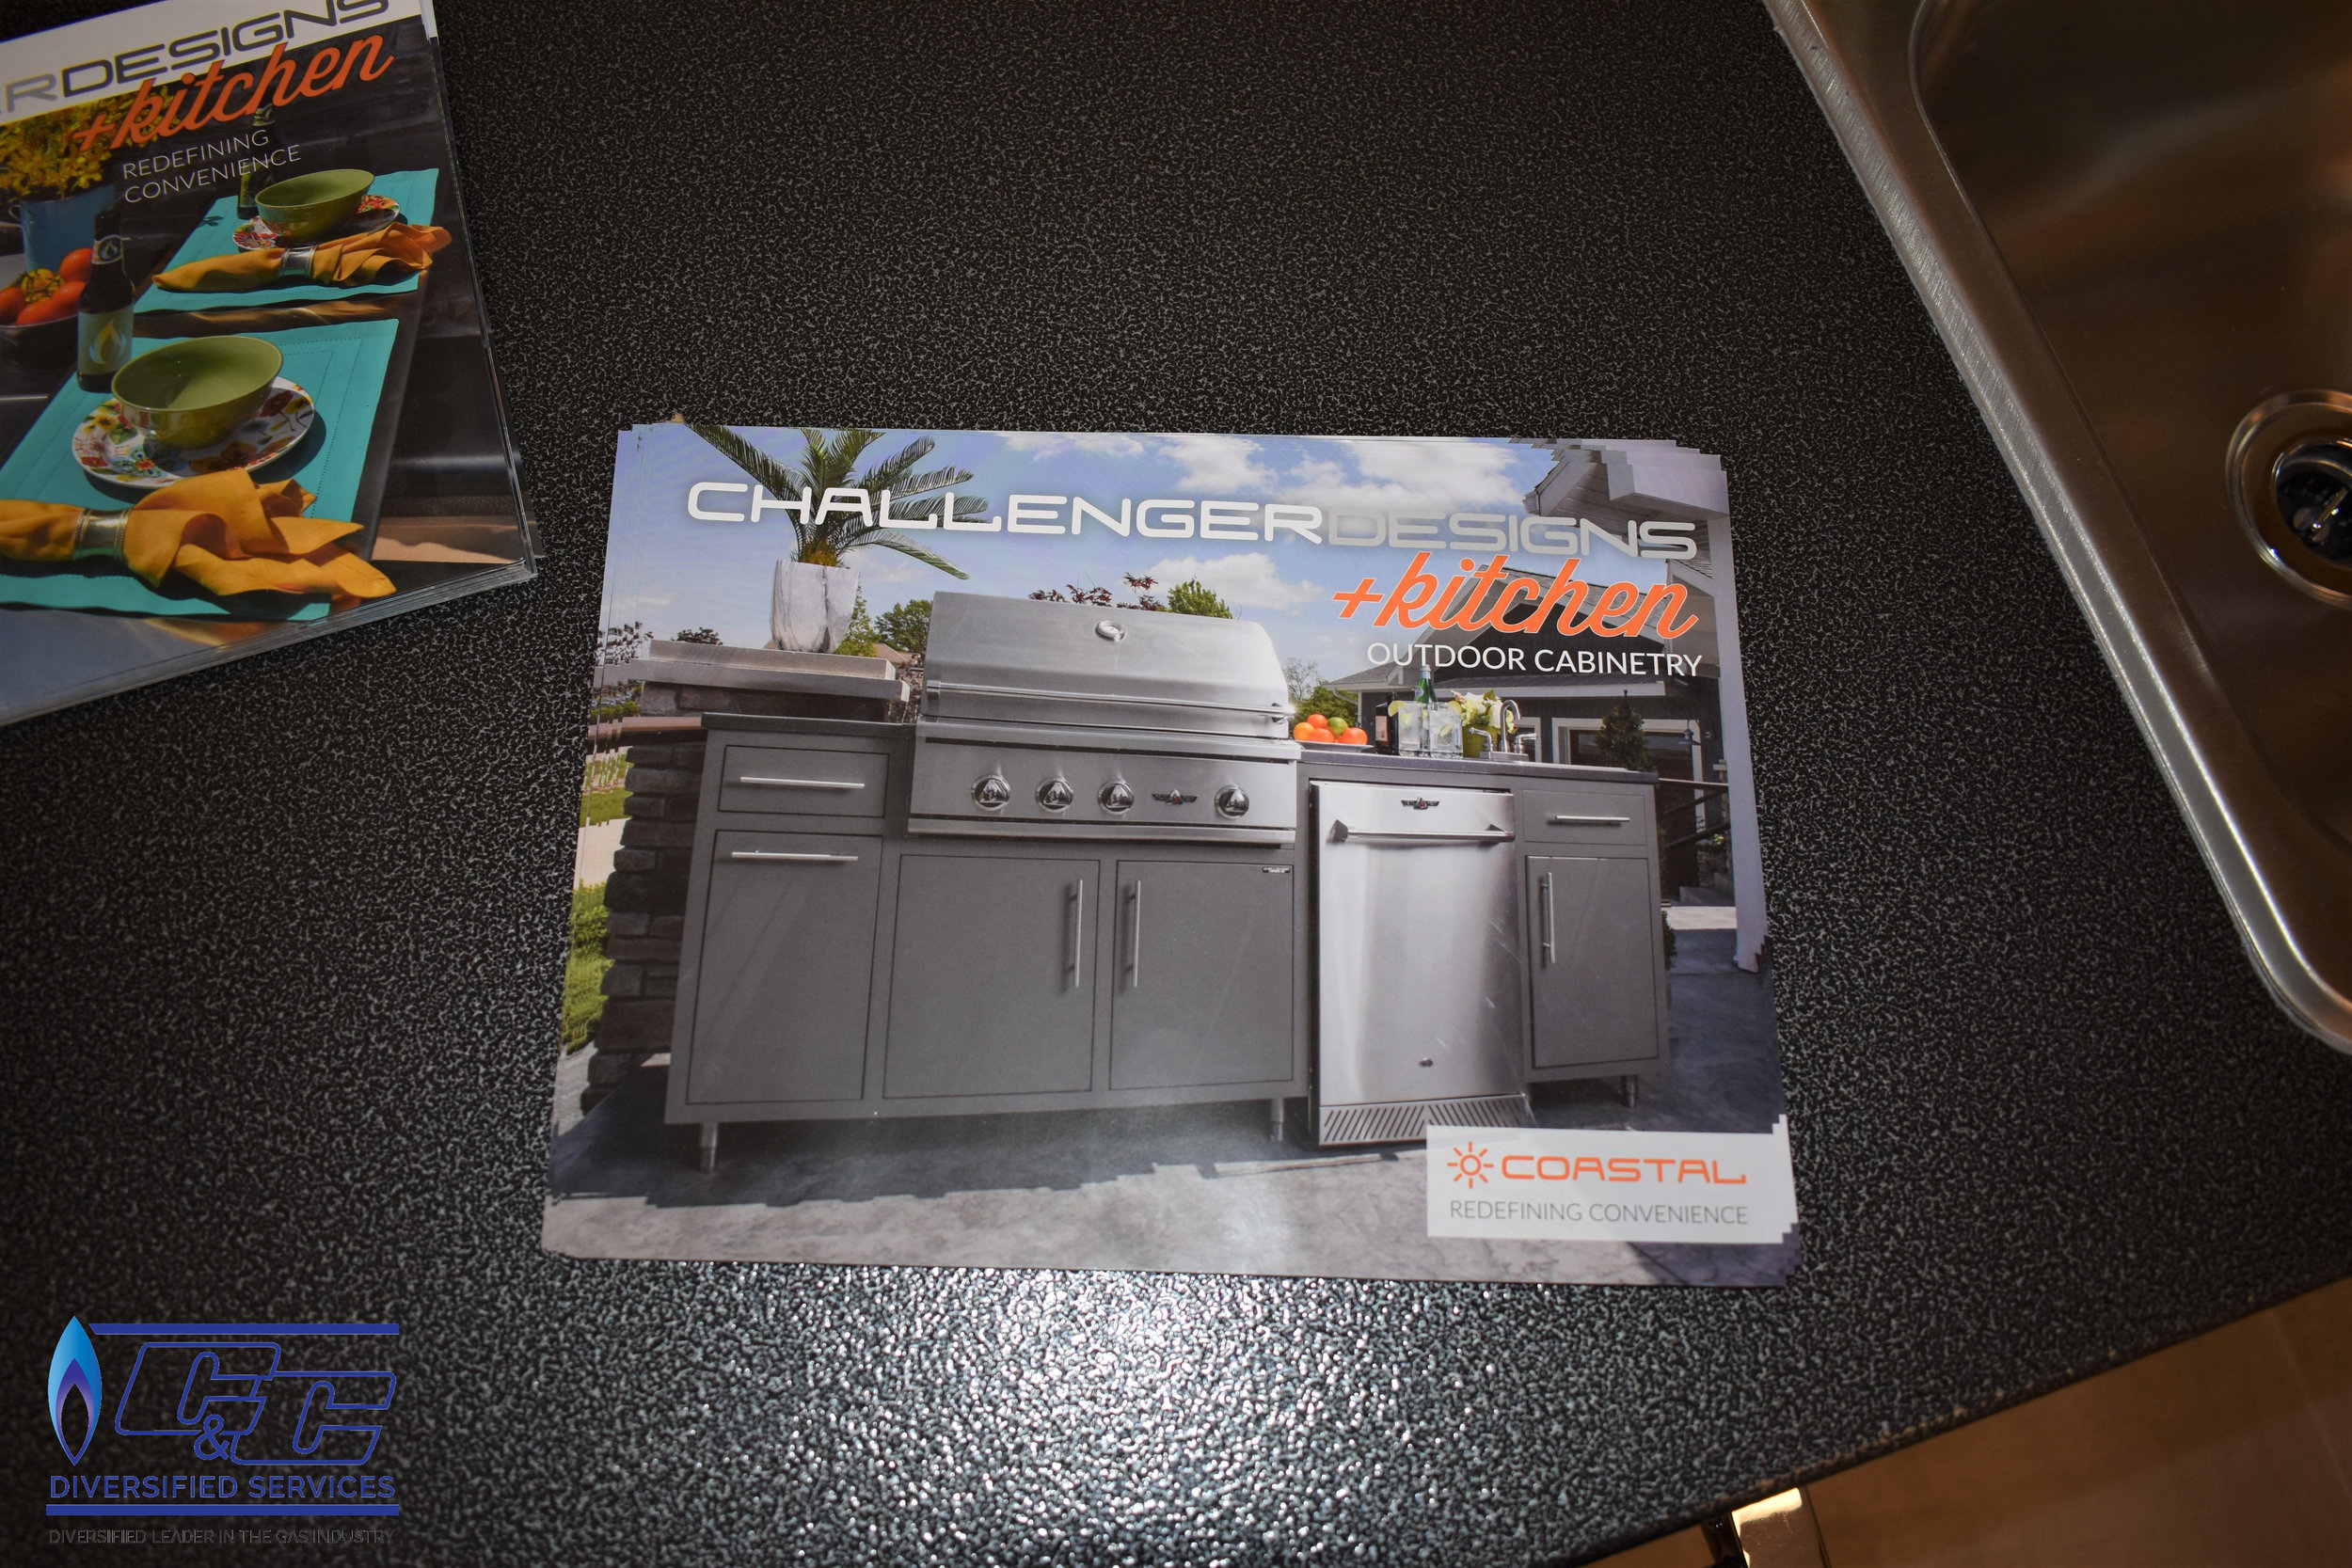 Challenger Designs & Kitchen Custom Options Outdoor Cabinetry